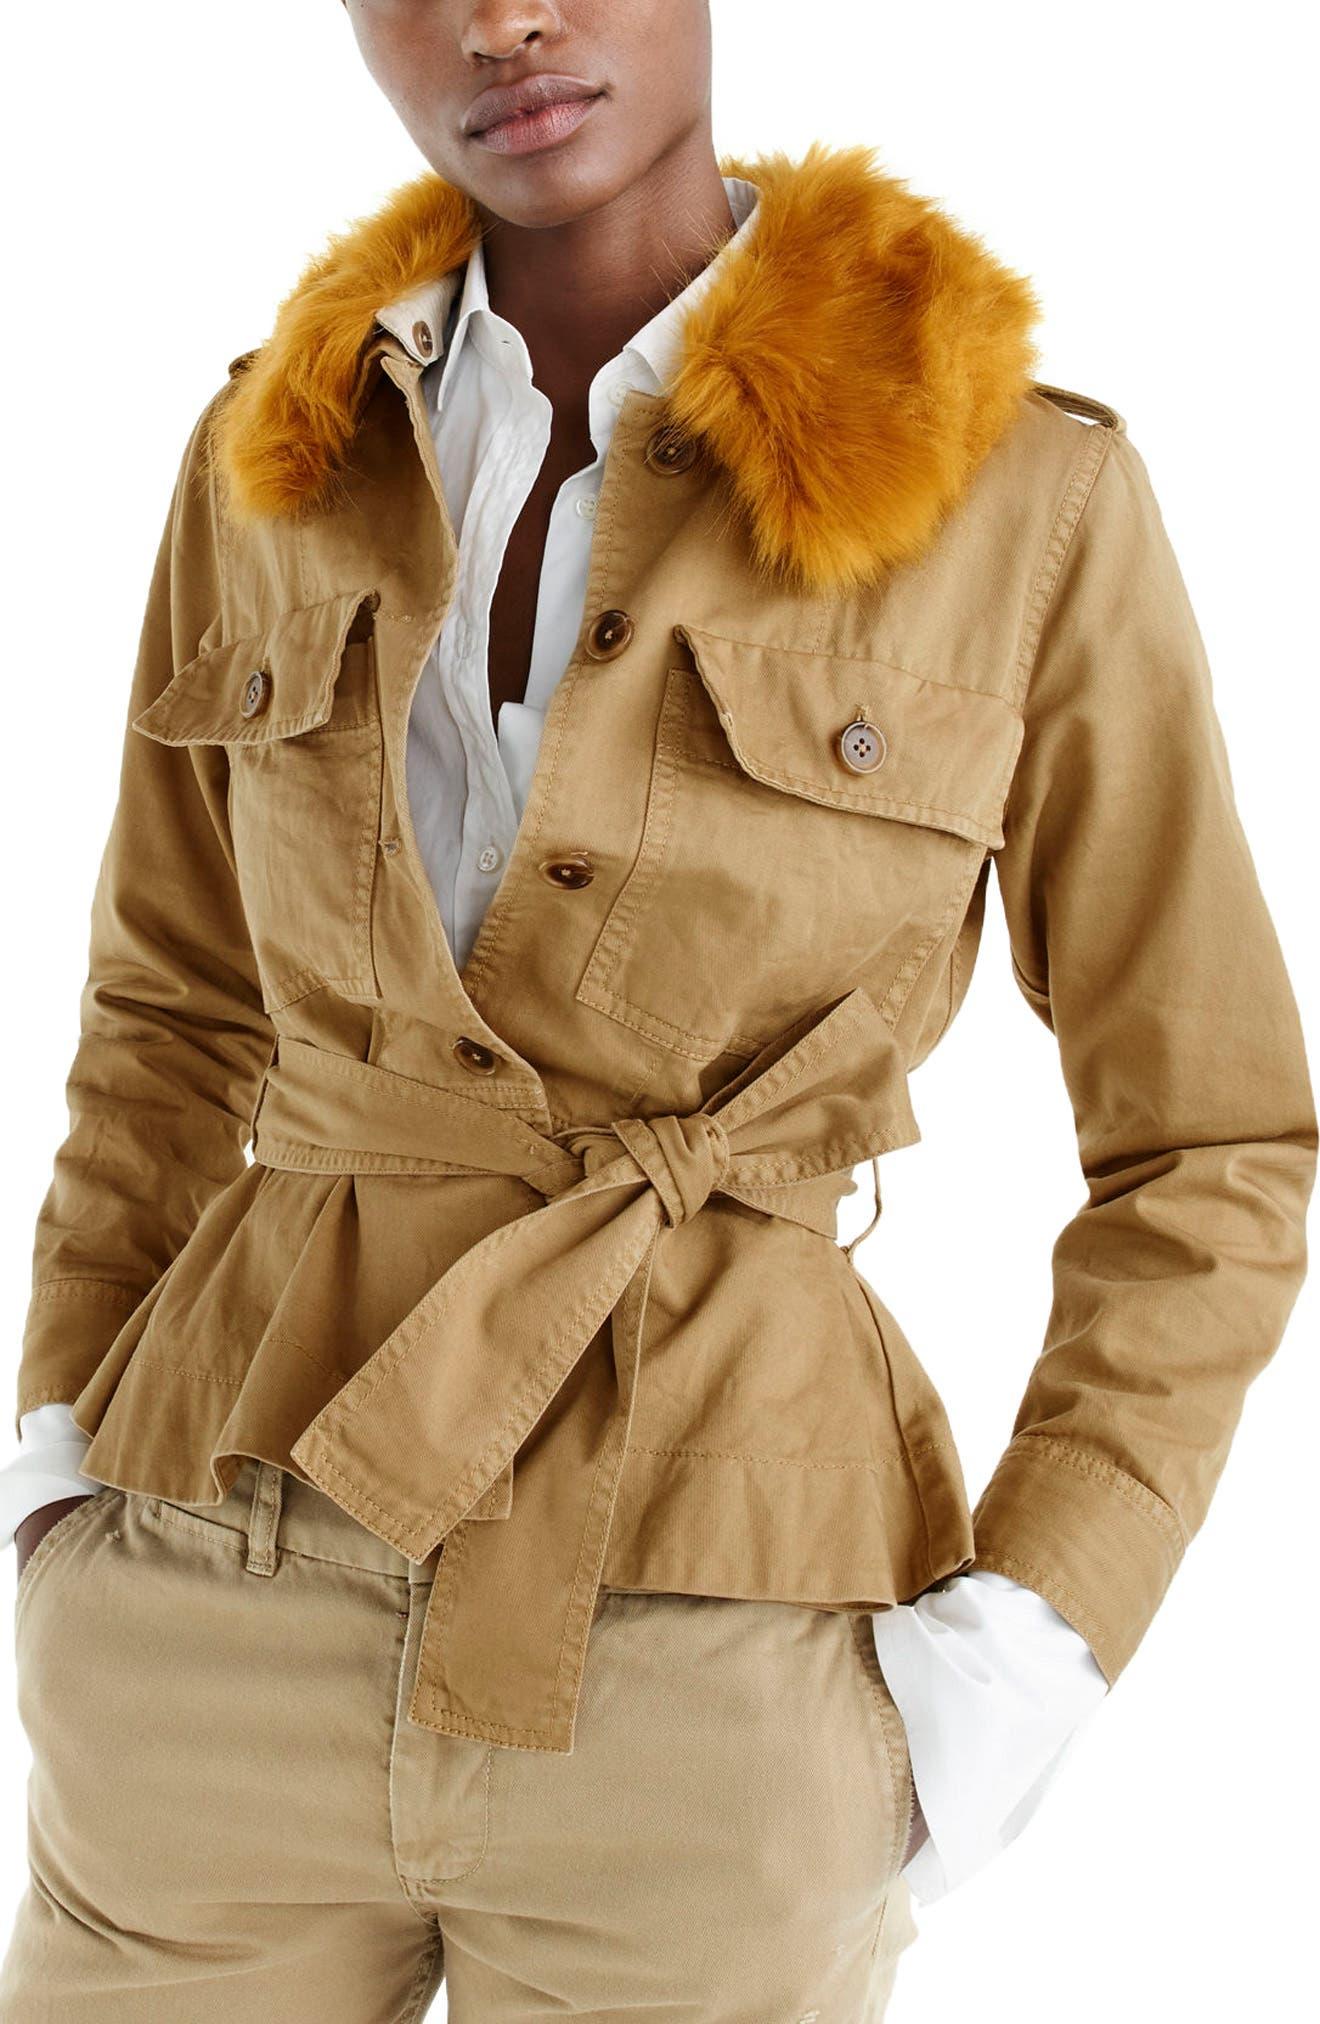 Main Image - J.Crew Peplum Chino Faux Fur Collar Jacket